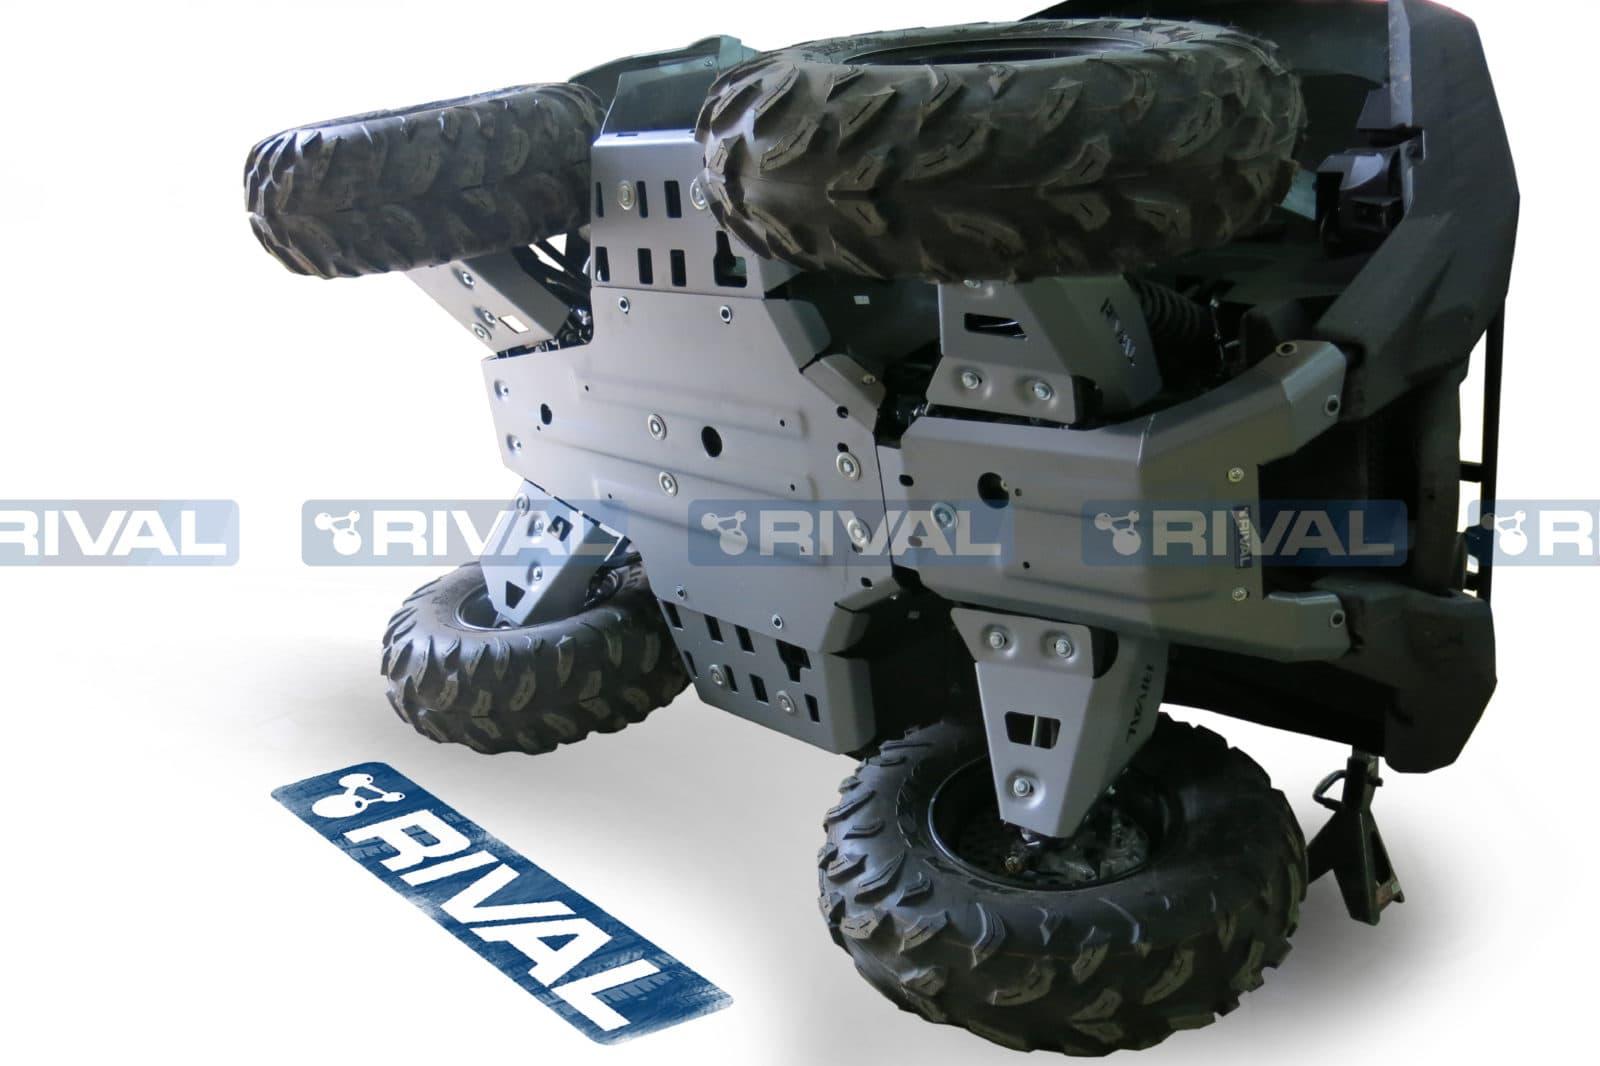 RV-2444-7124-1